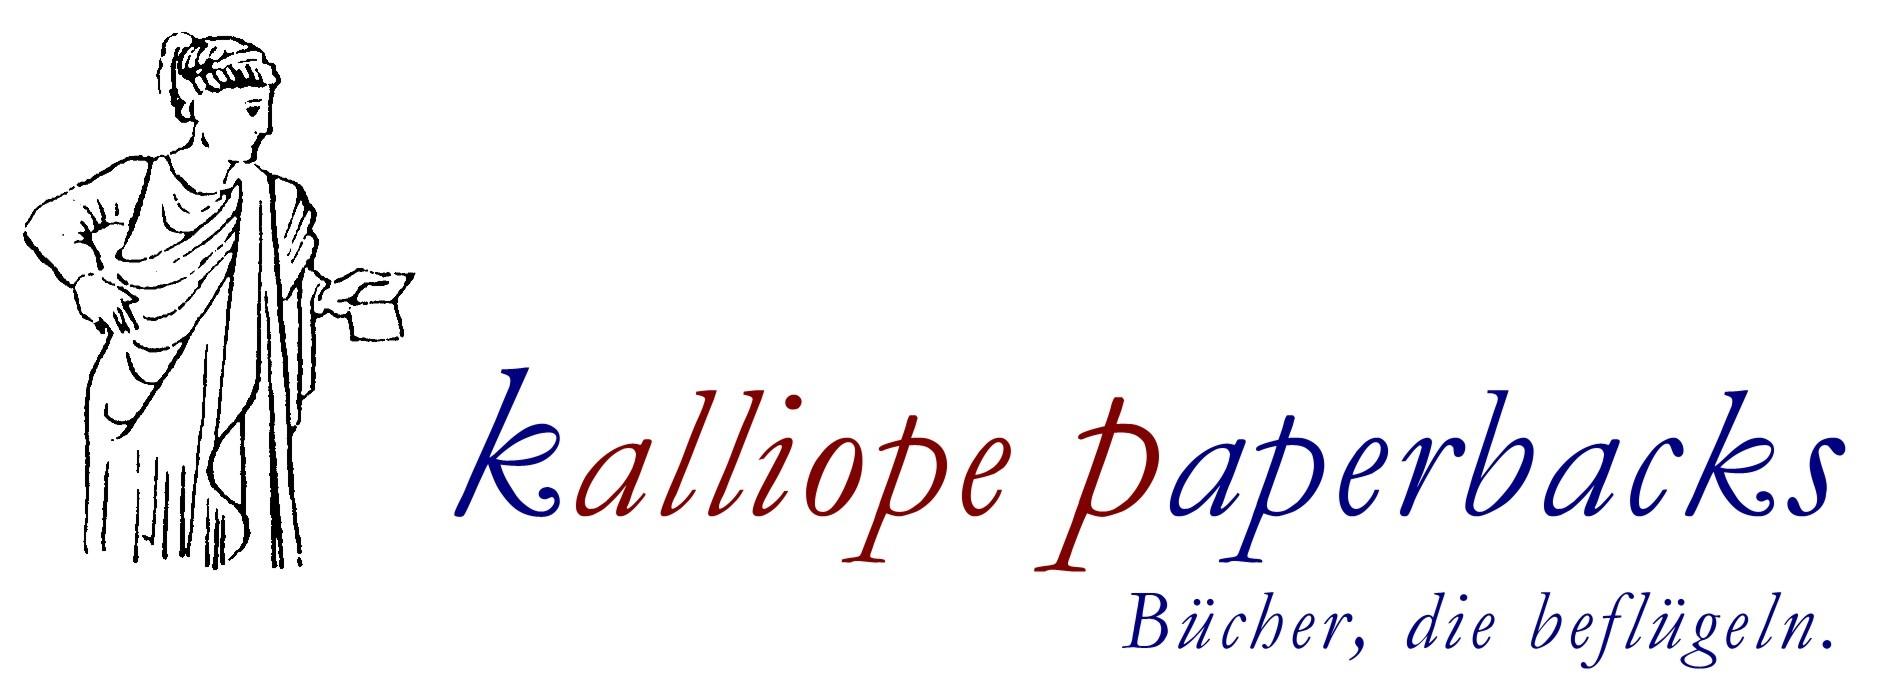 logo-kalliope-paperbacks